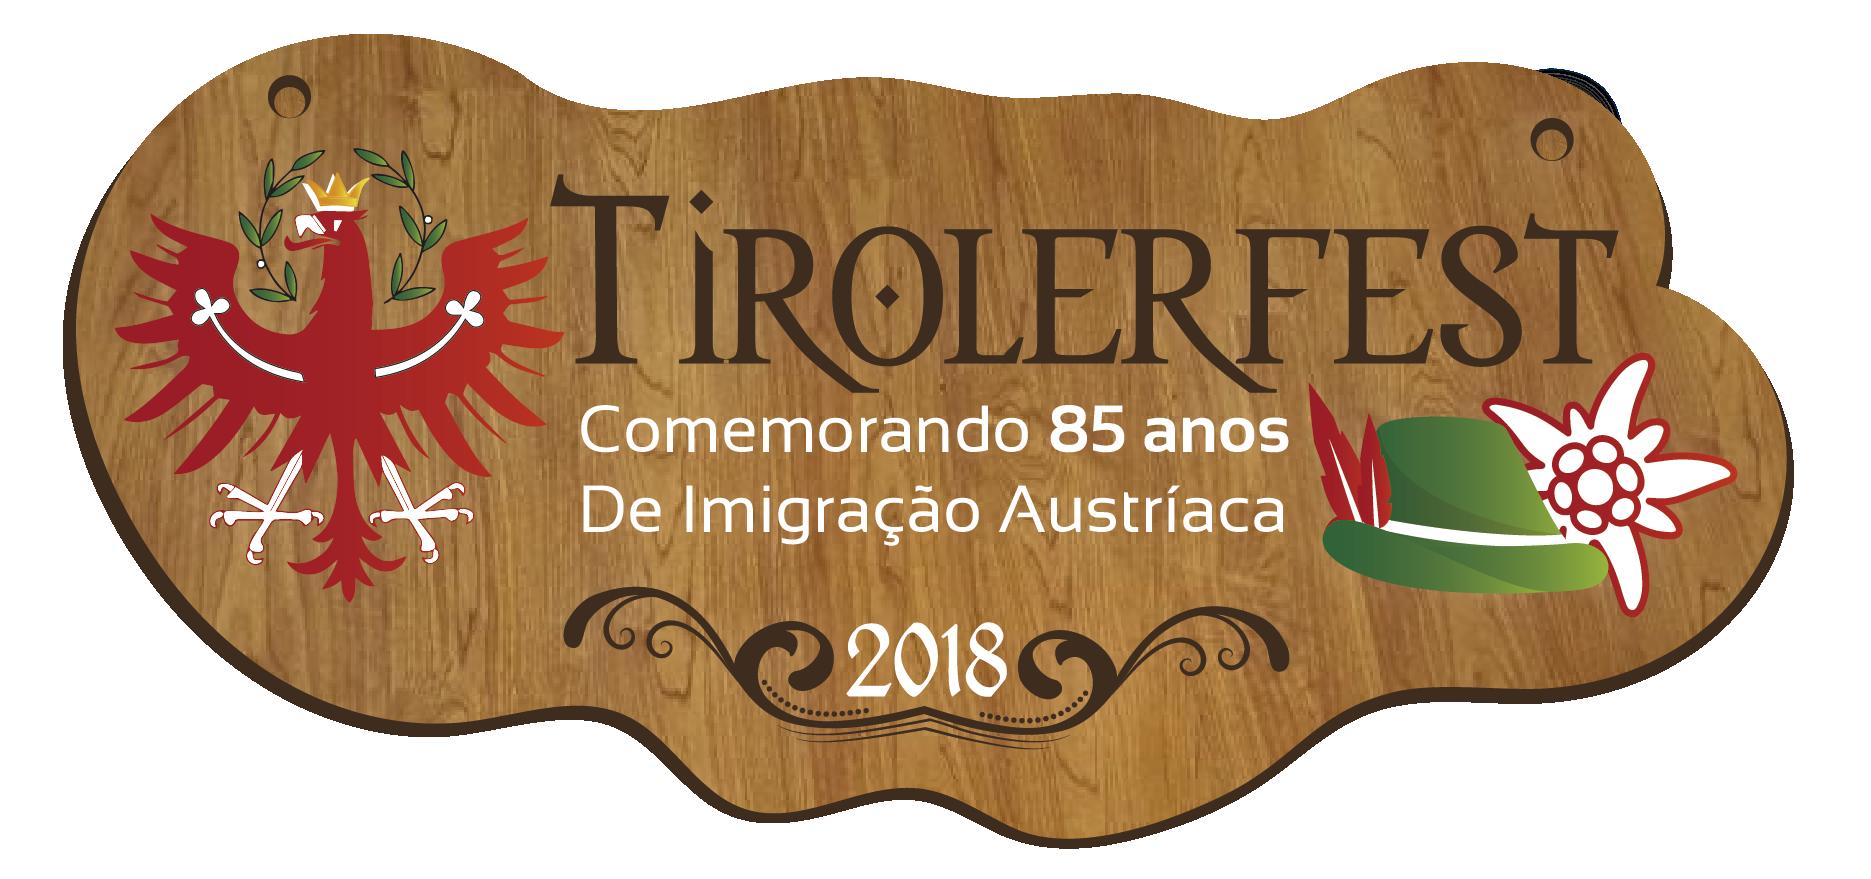 Tirolerfest